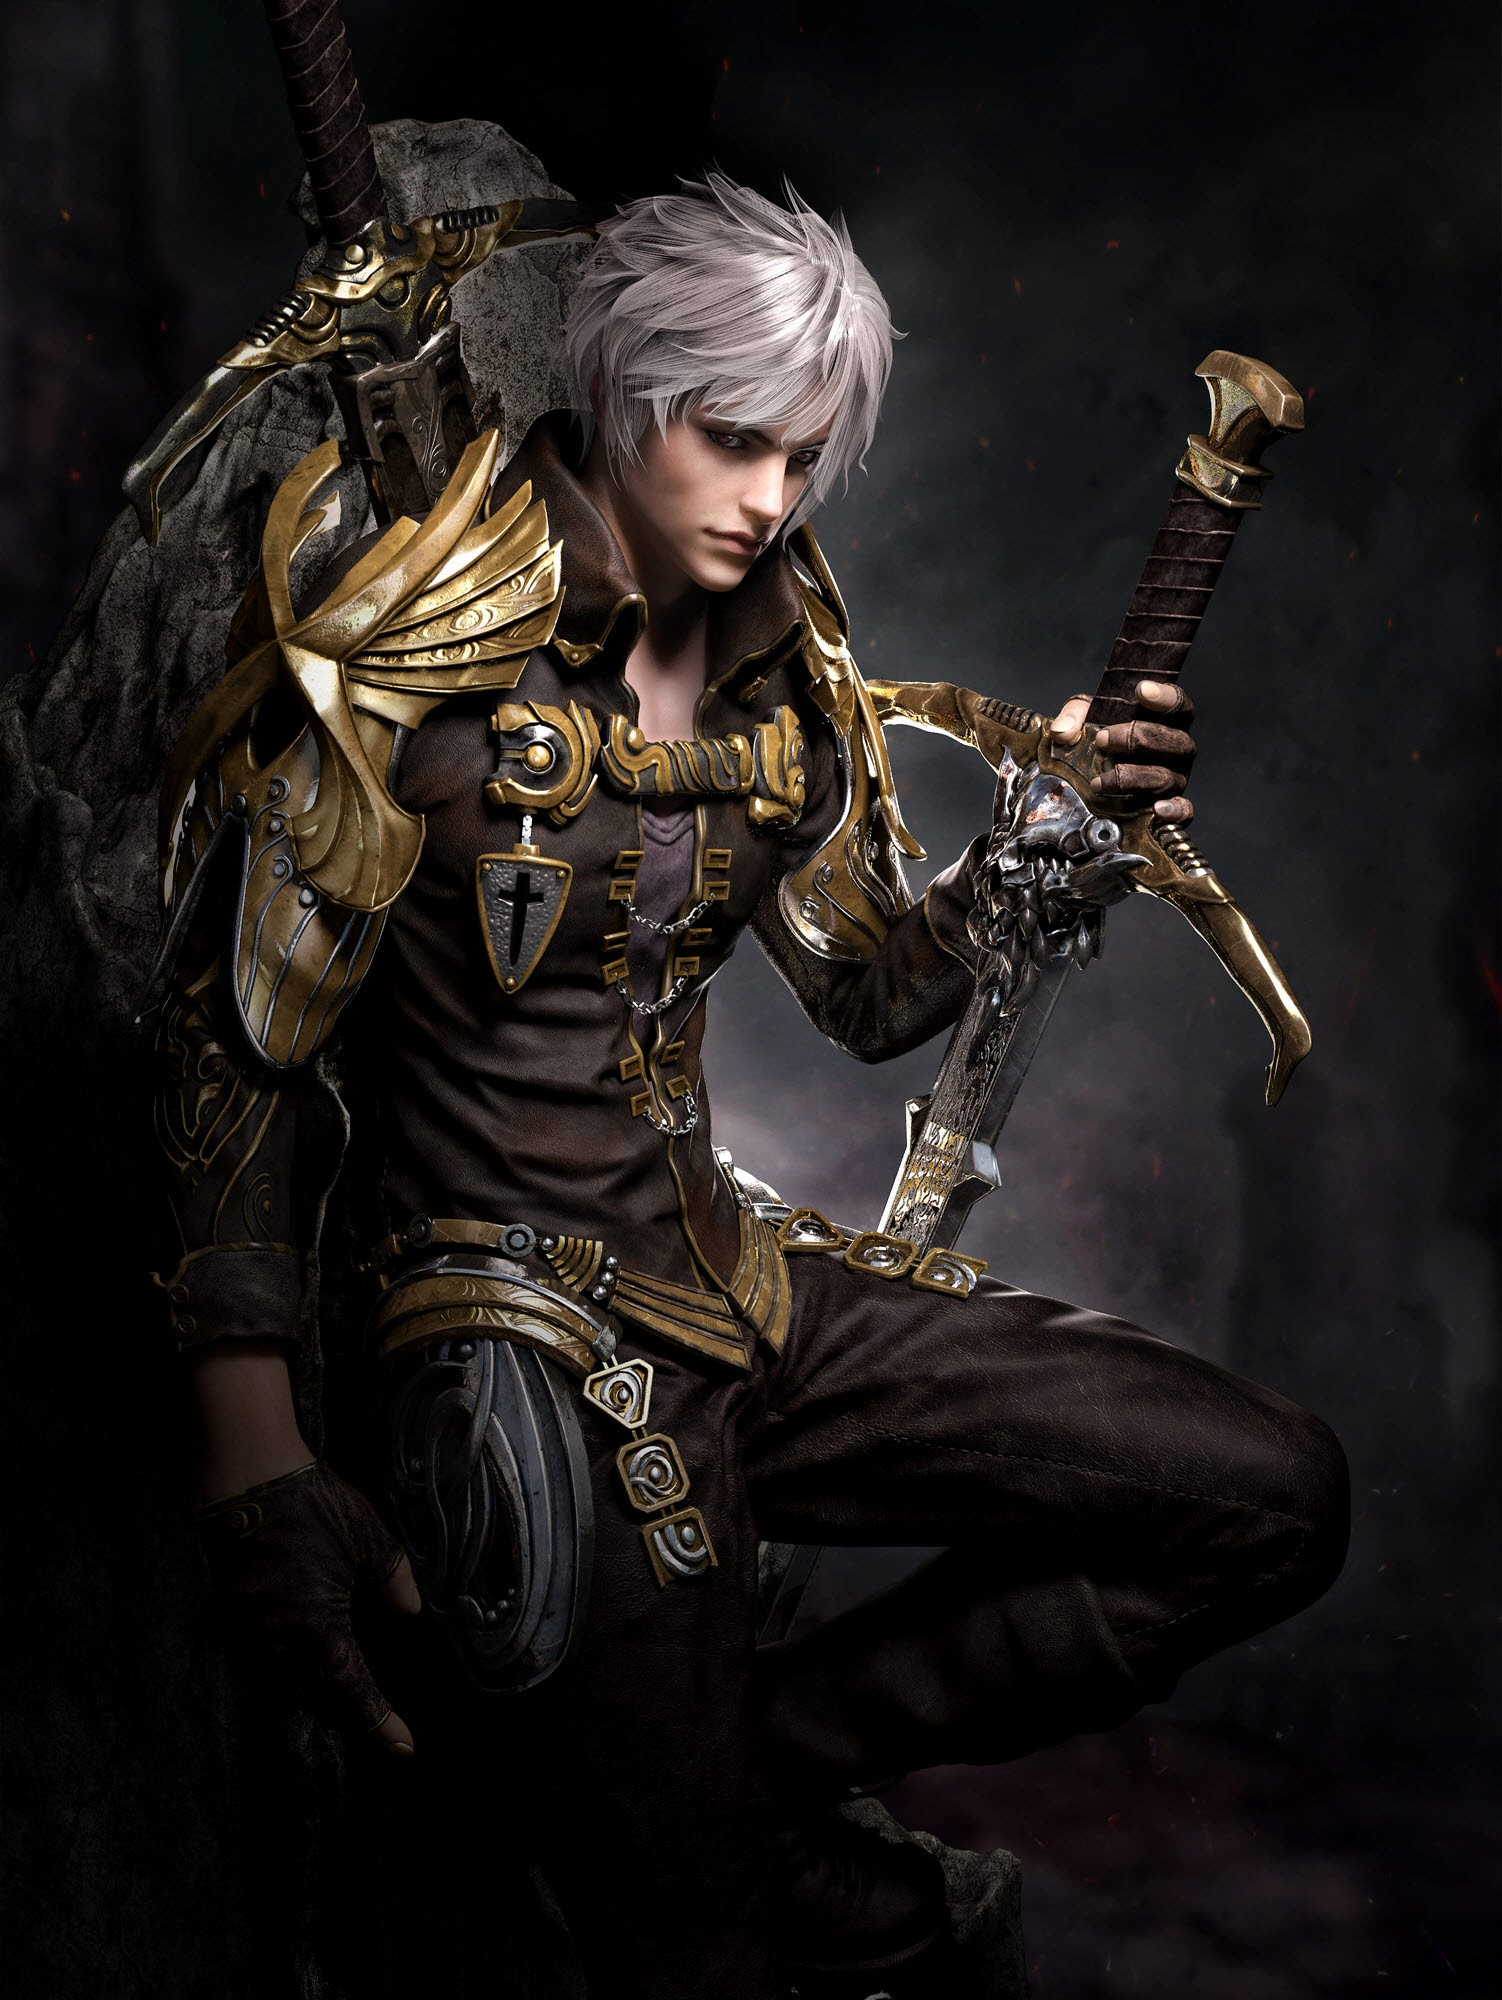 General 1502x2000 sword fantasy art grey hair armor